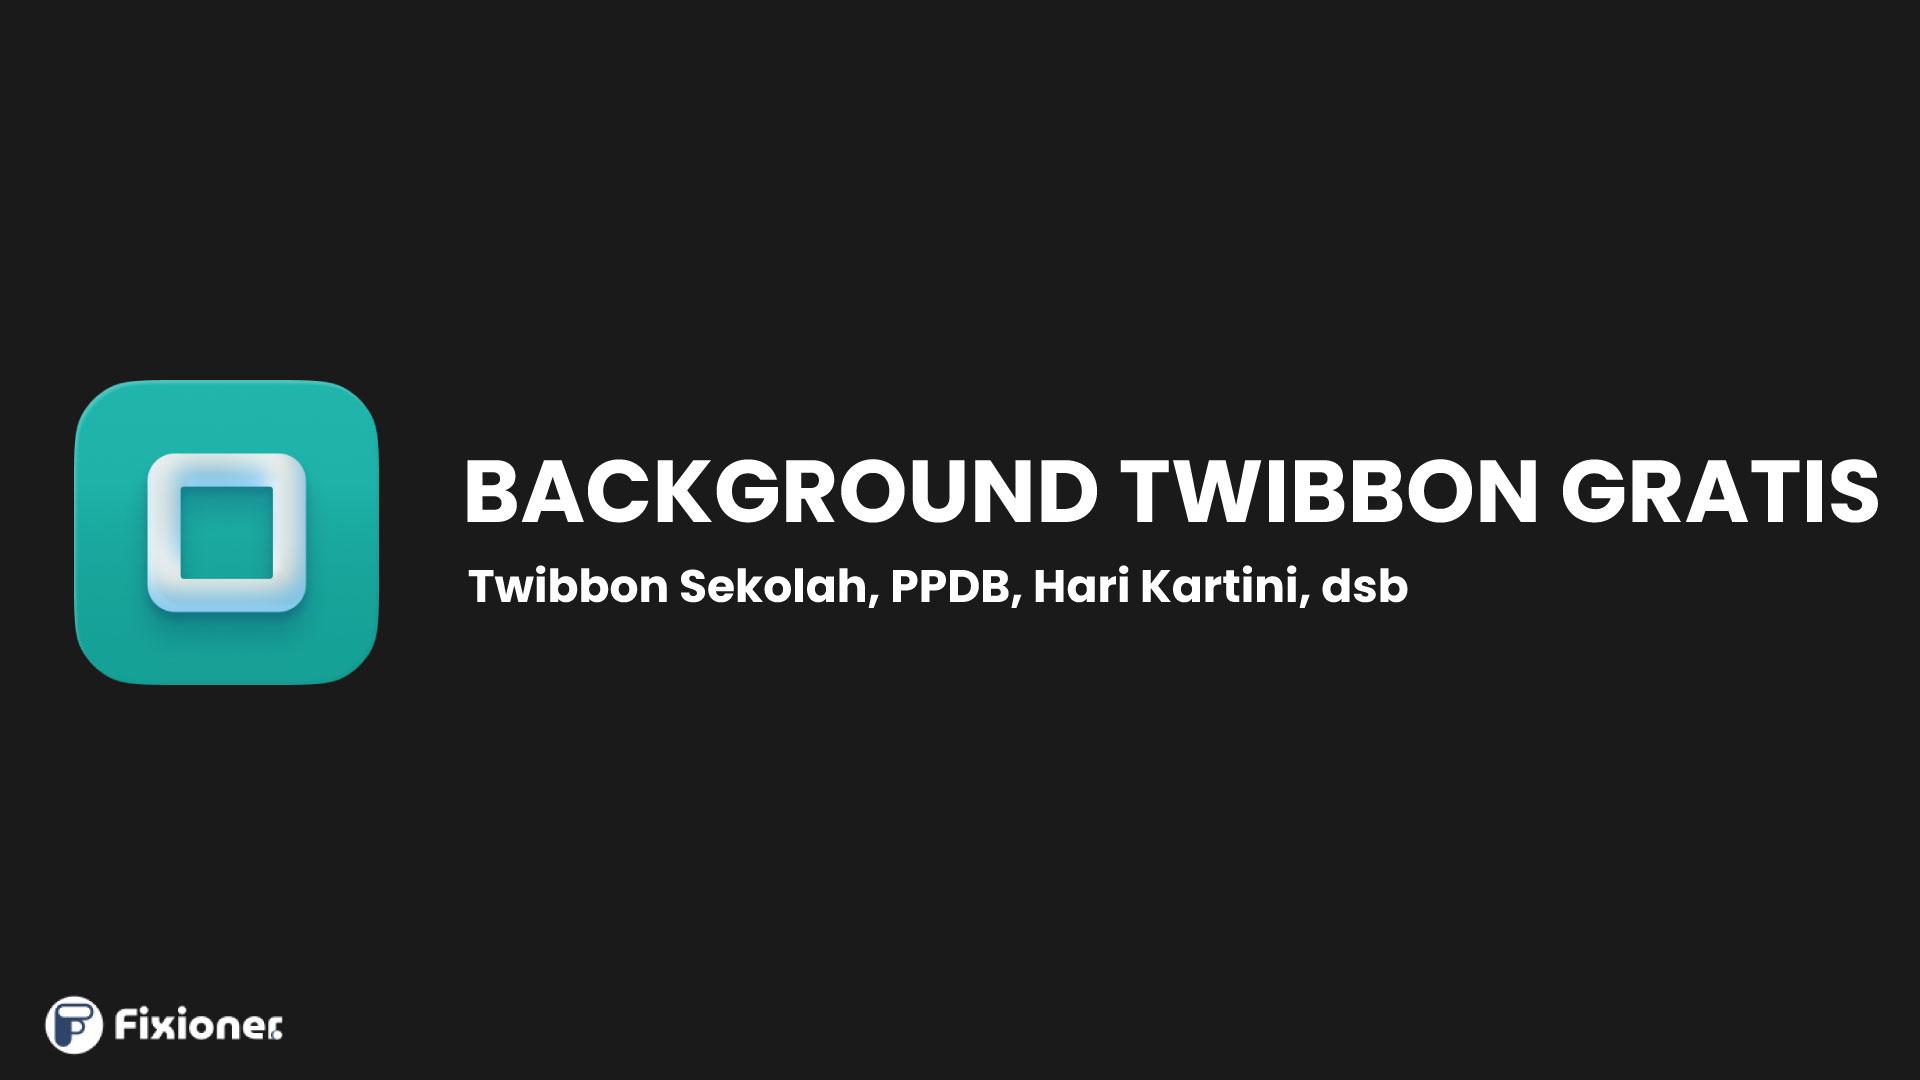 Background Twibbon